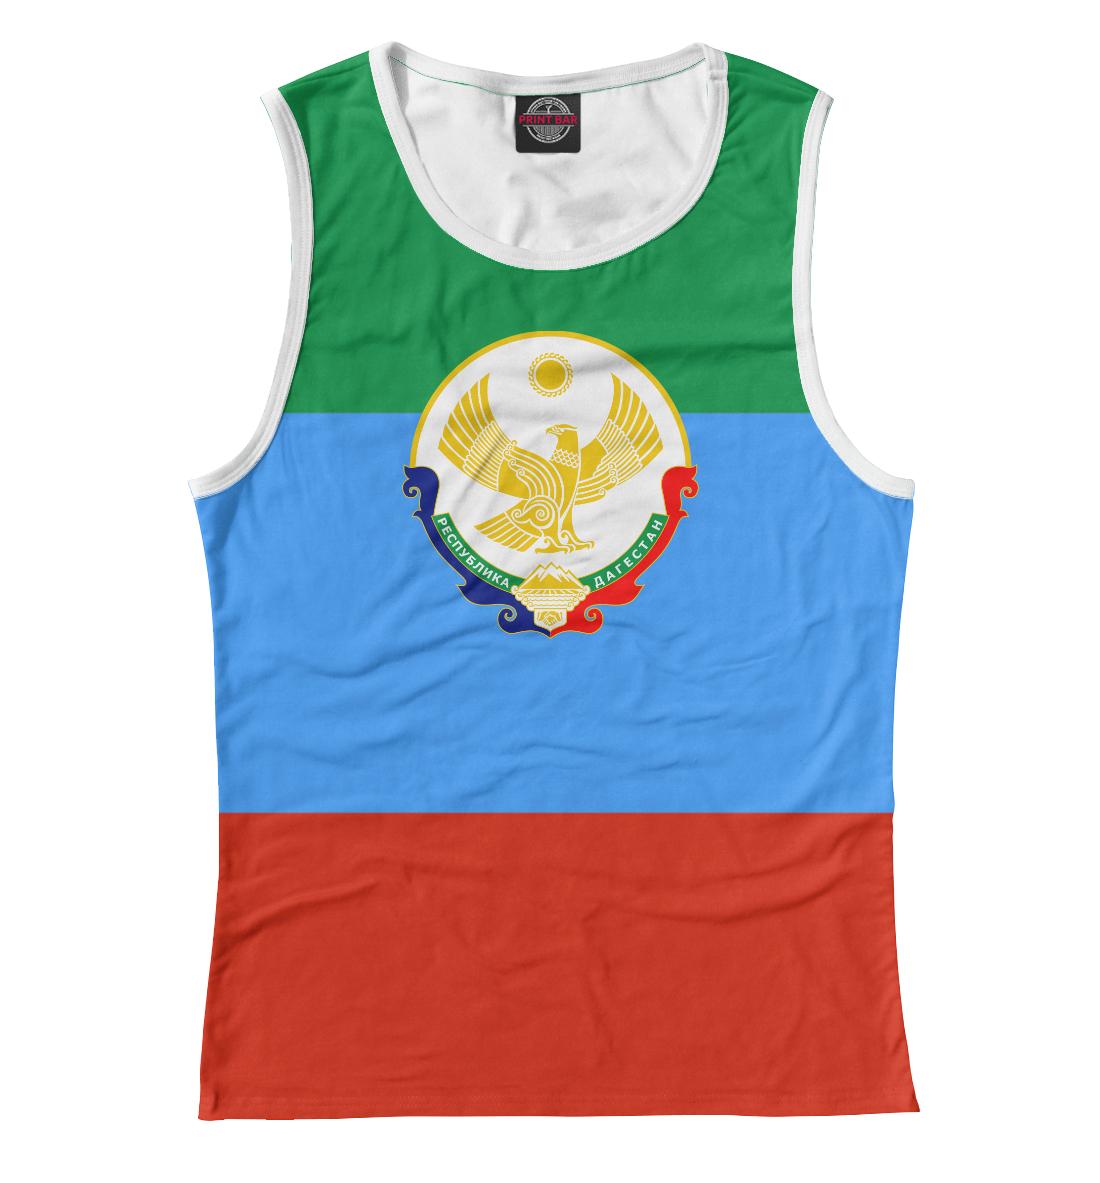 Купить Дагестан, Printbar, Майки, VSY-164431-may-1